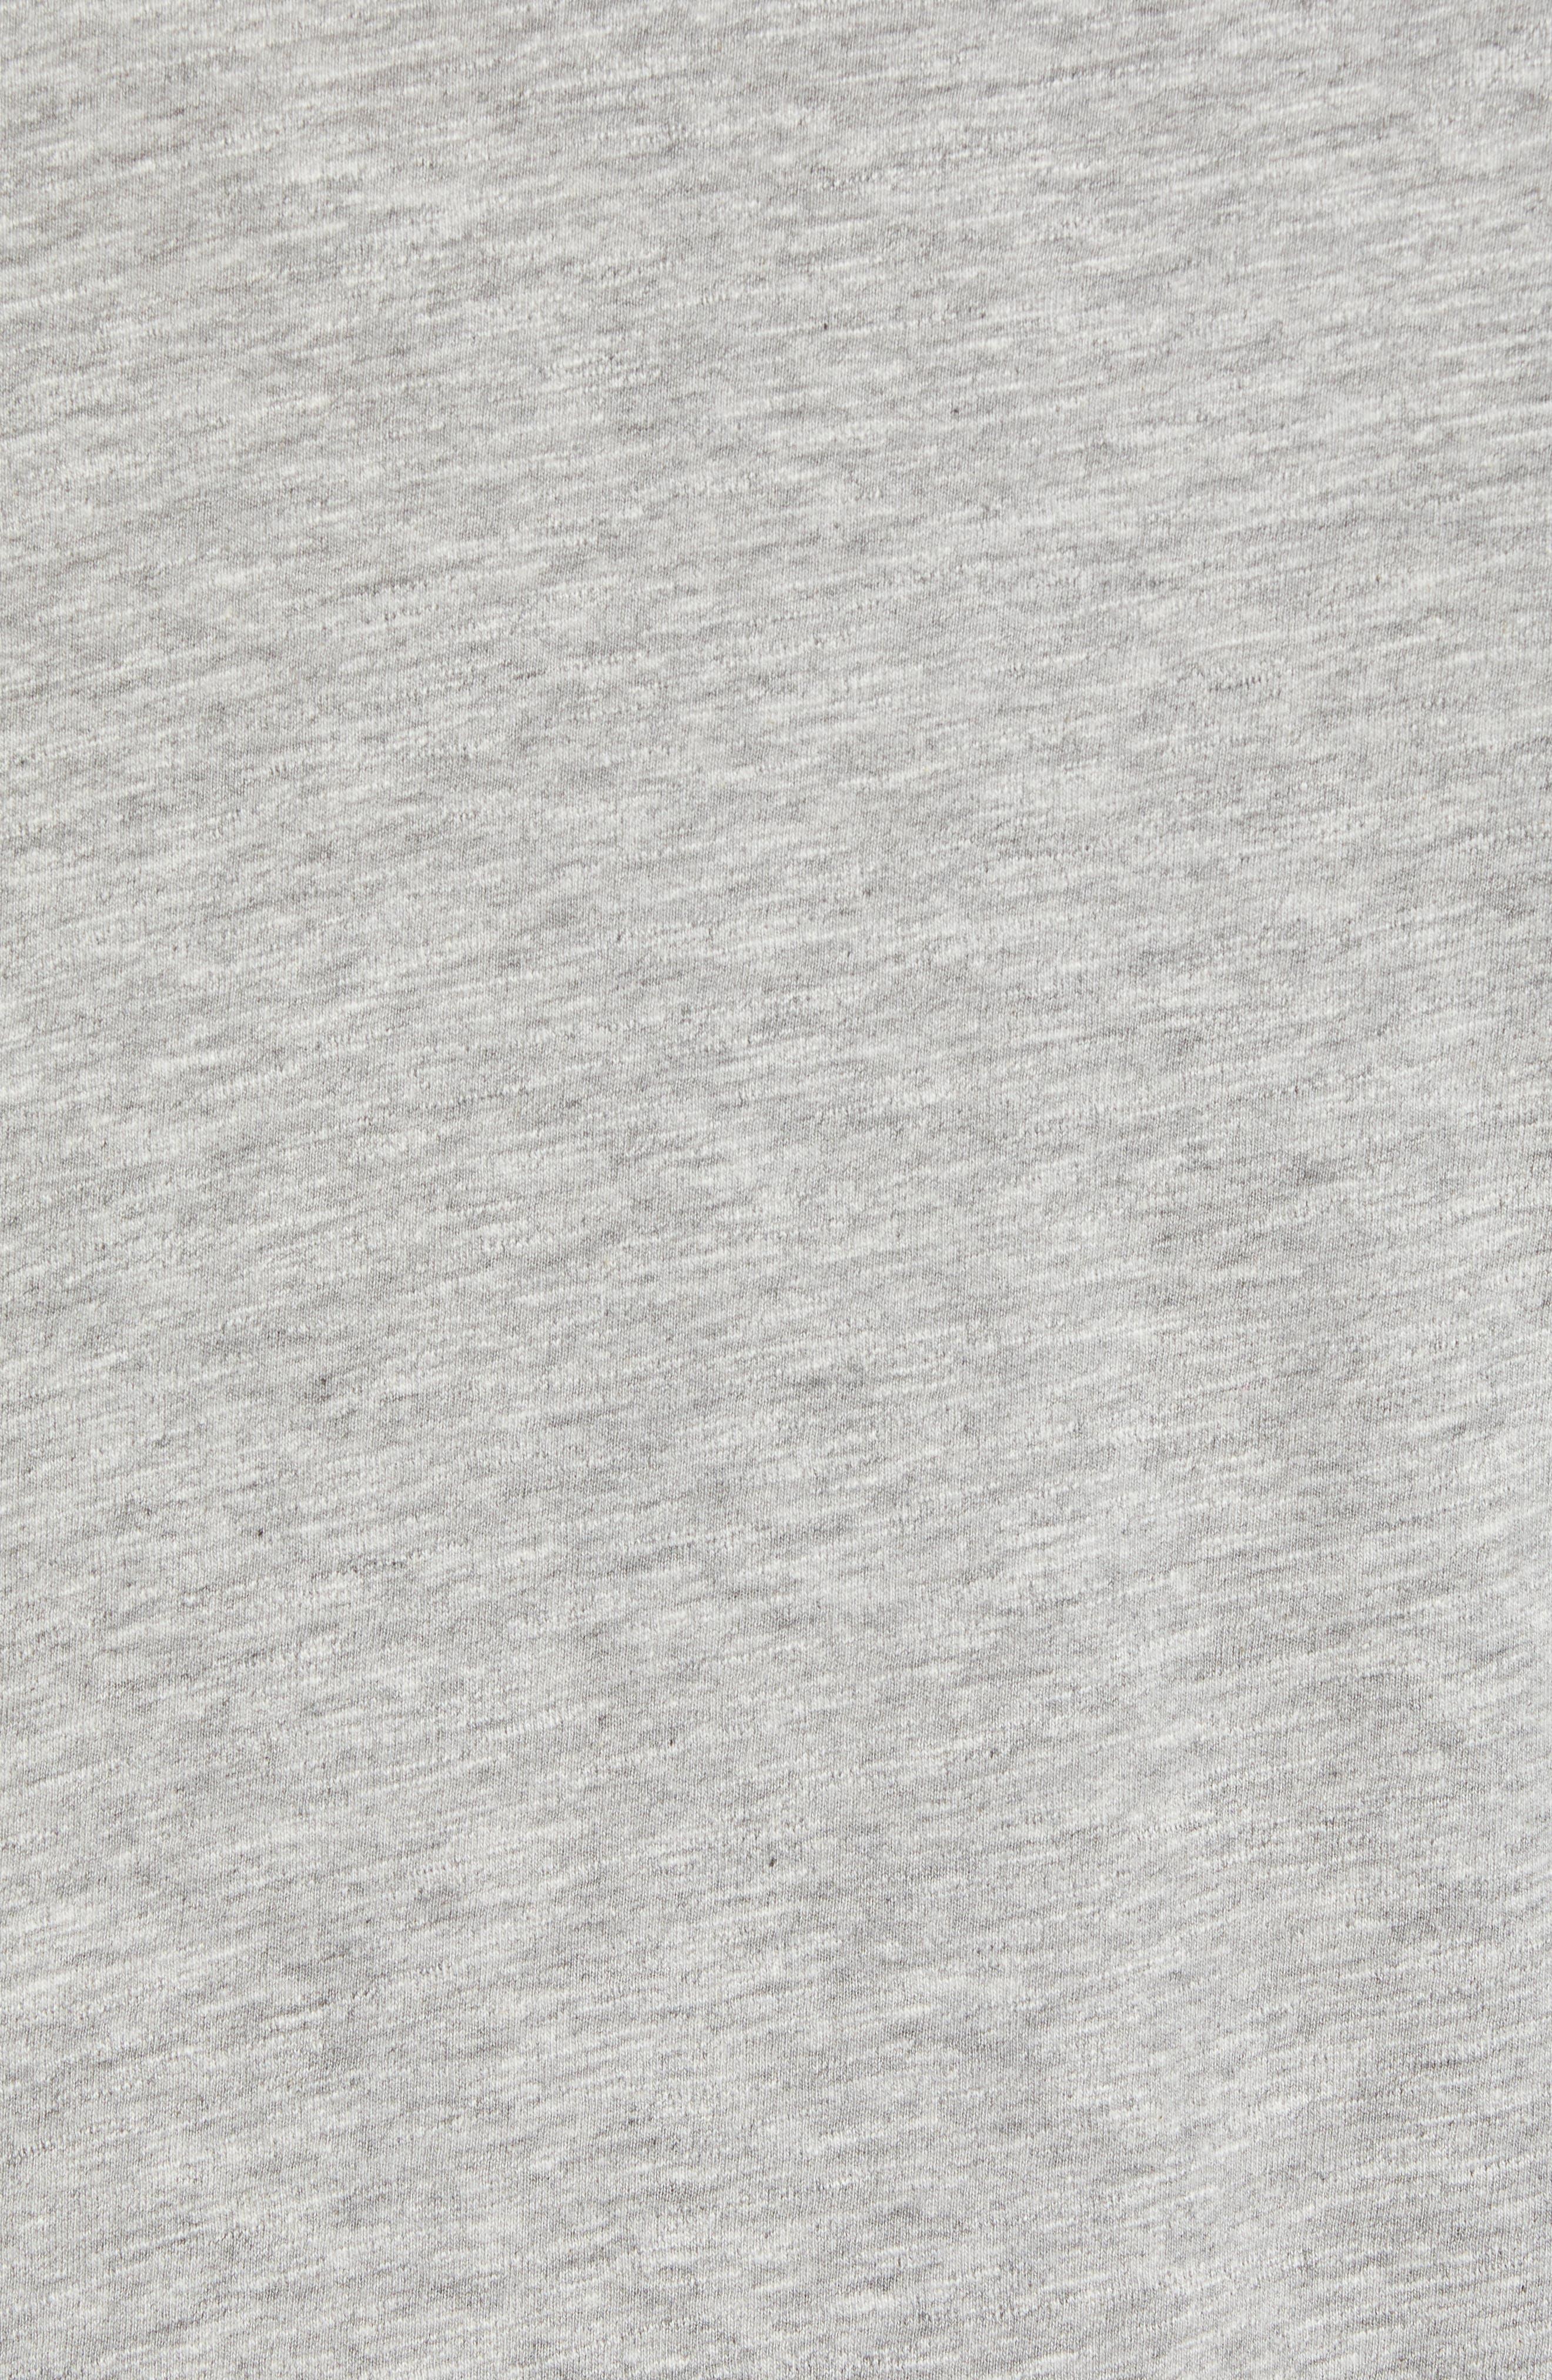 Collegiate Graphic T-Shirt,                             Alternate thumbnail 5, color,                             LIGHT GREY HEATHER